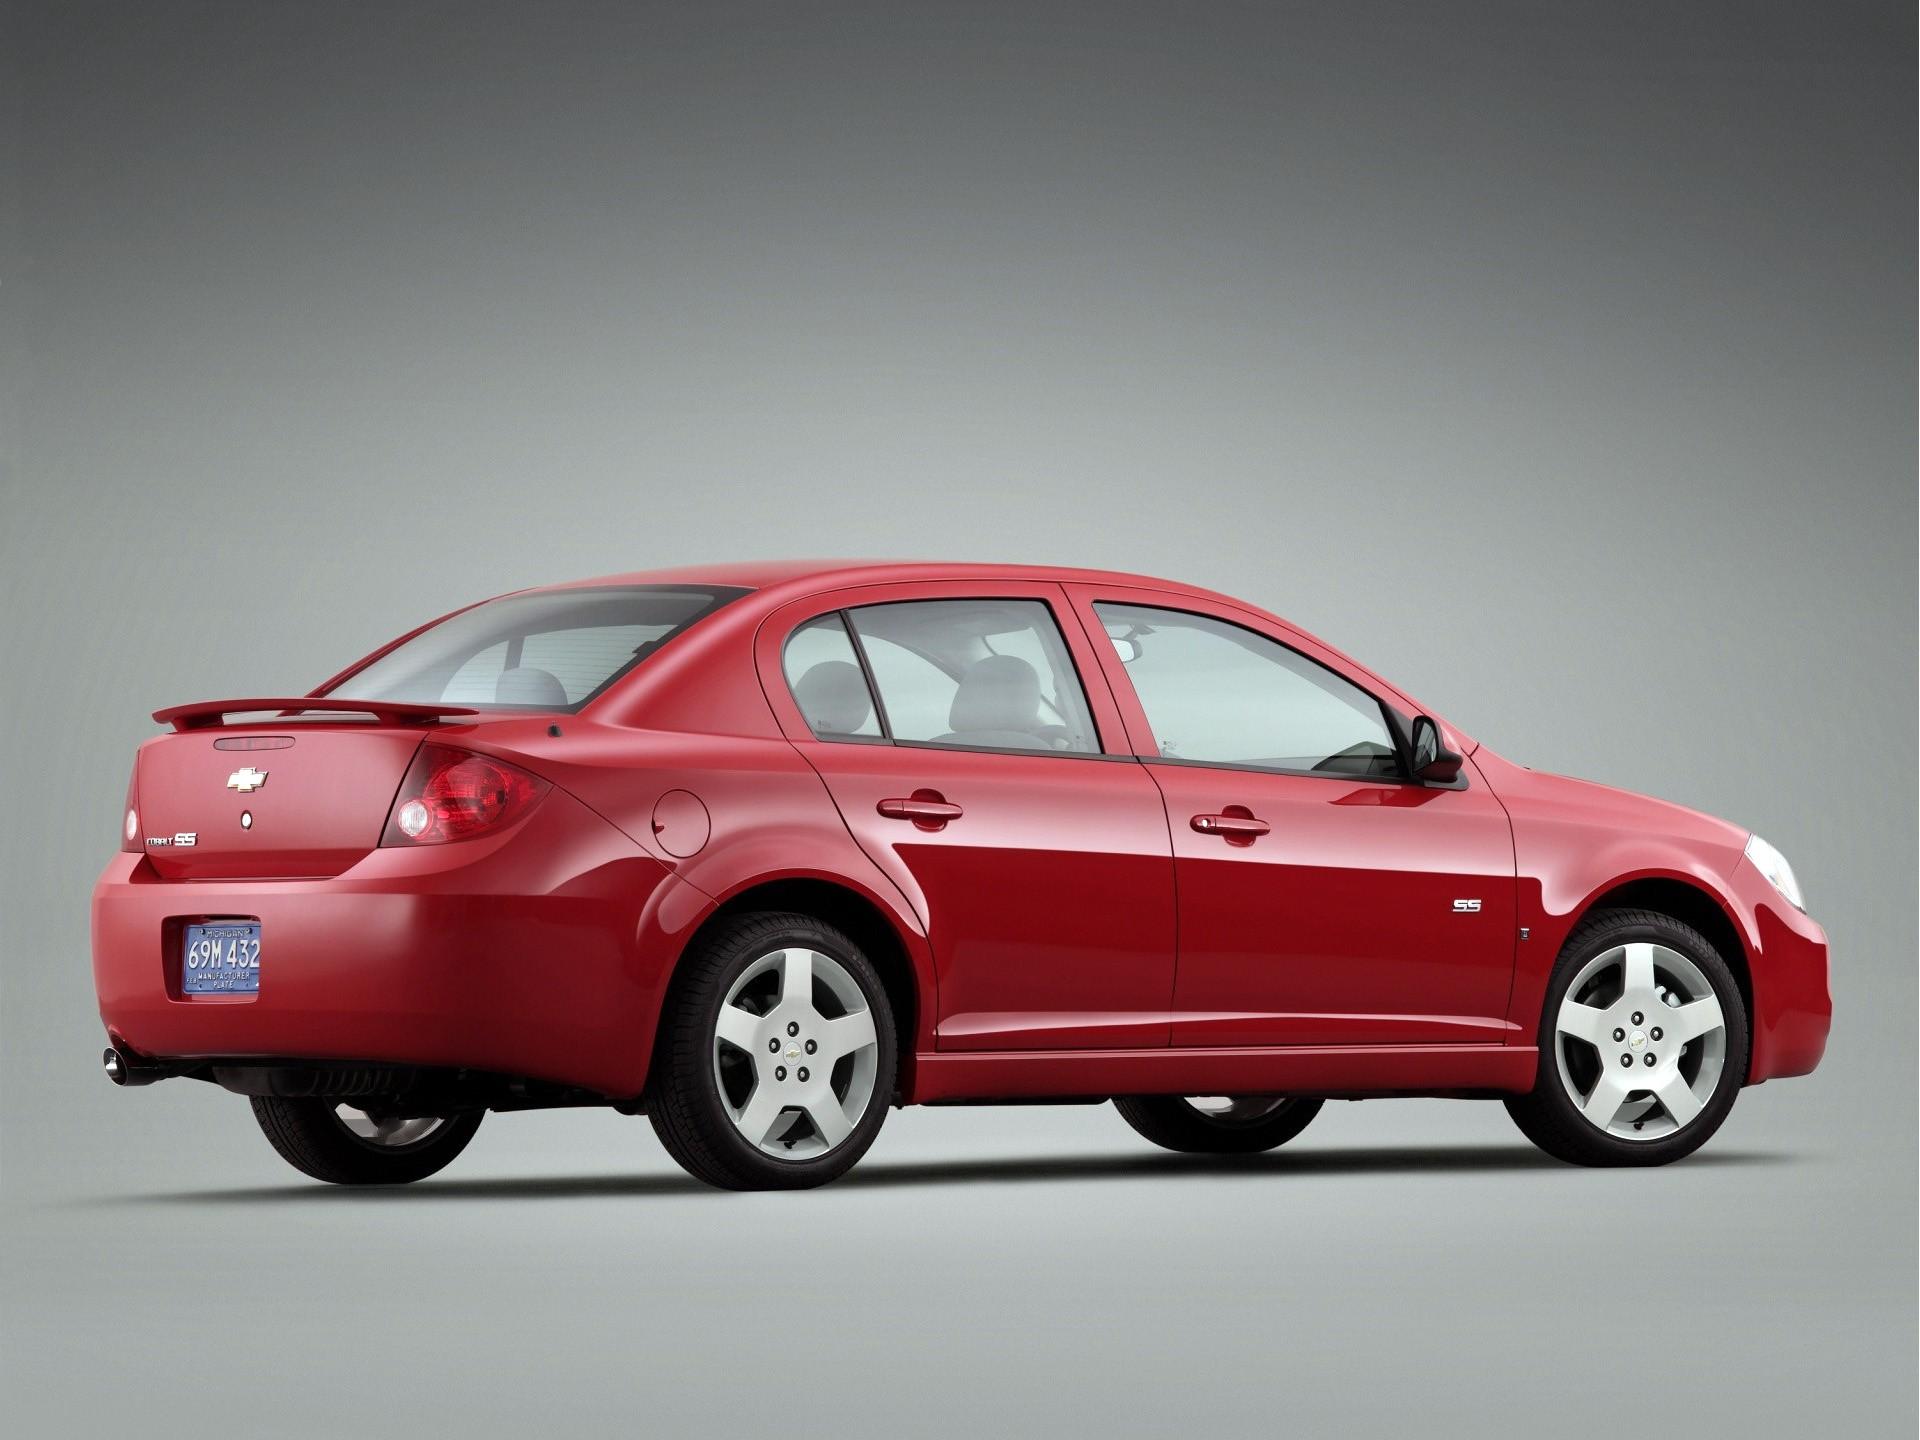 CHEVROLET Cobalt Sedan SS - 2008, 2009, 2010 - autoevolution